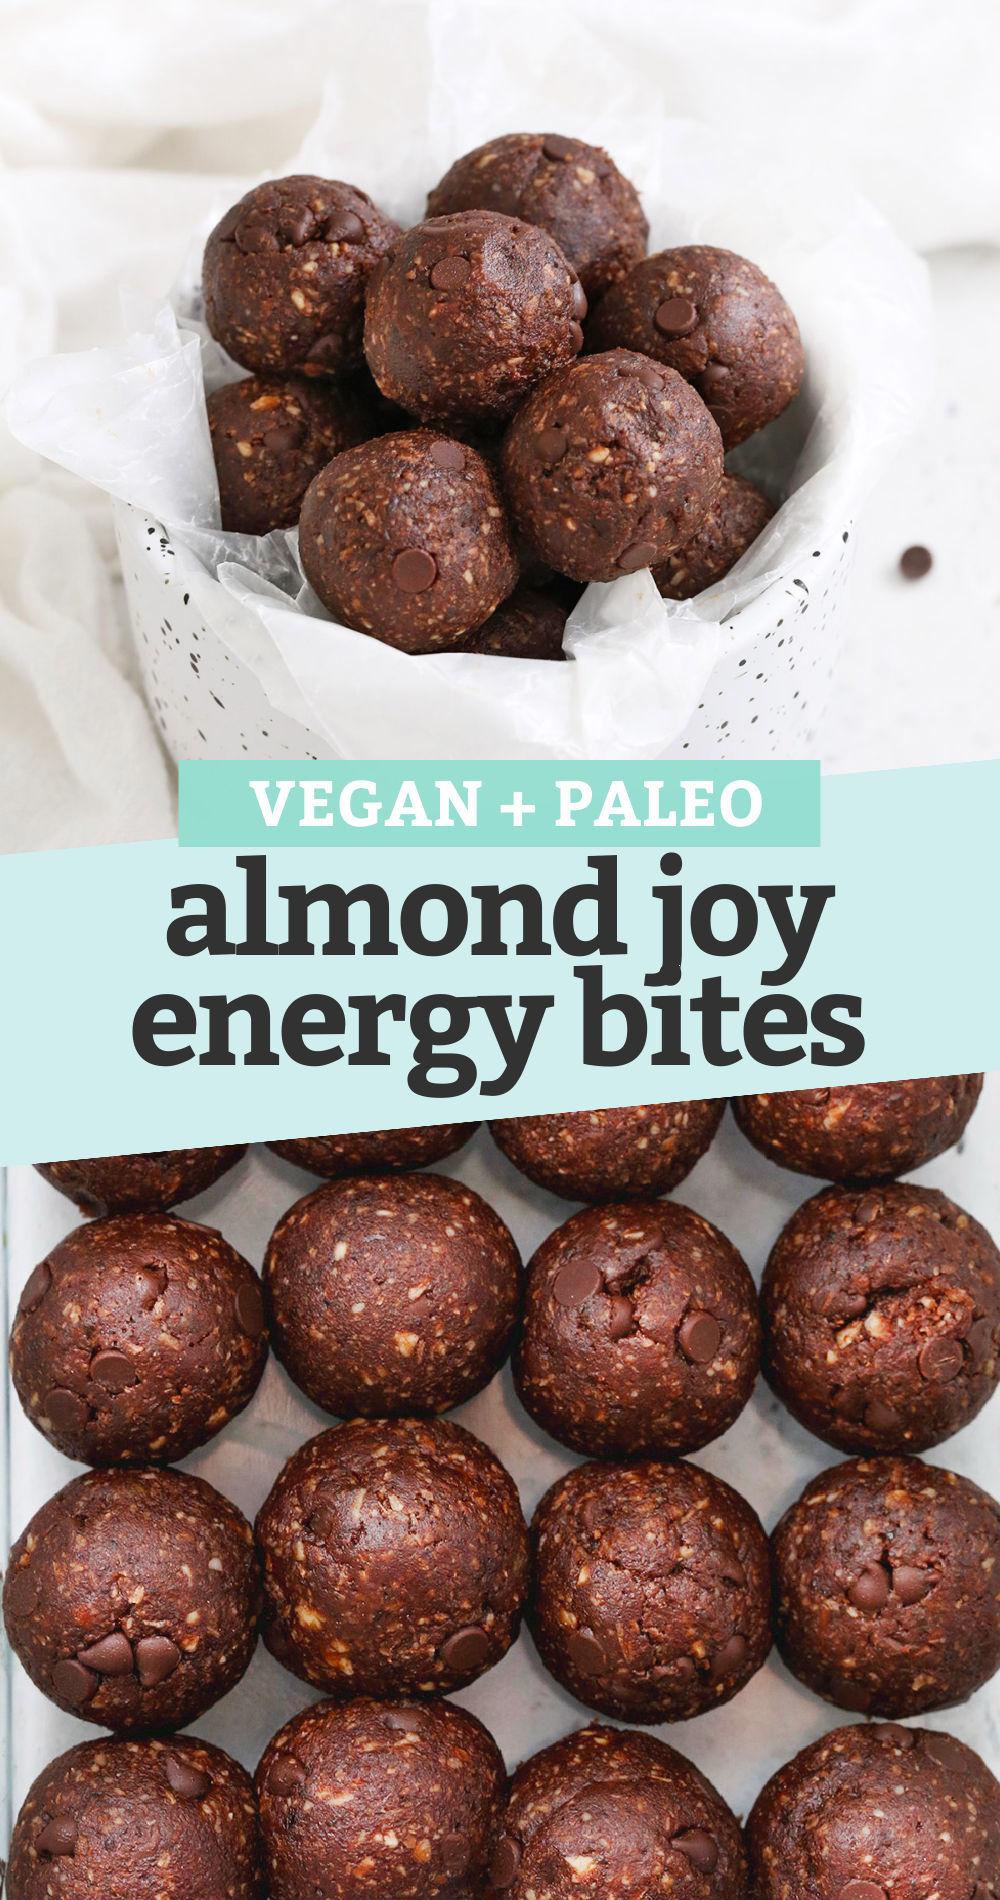 "Collage of images of almond joy energy bites with text overlay that reads ""vegan + paleo almond joy energy bites"""